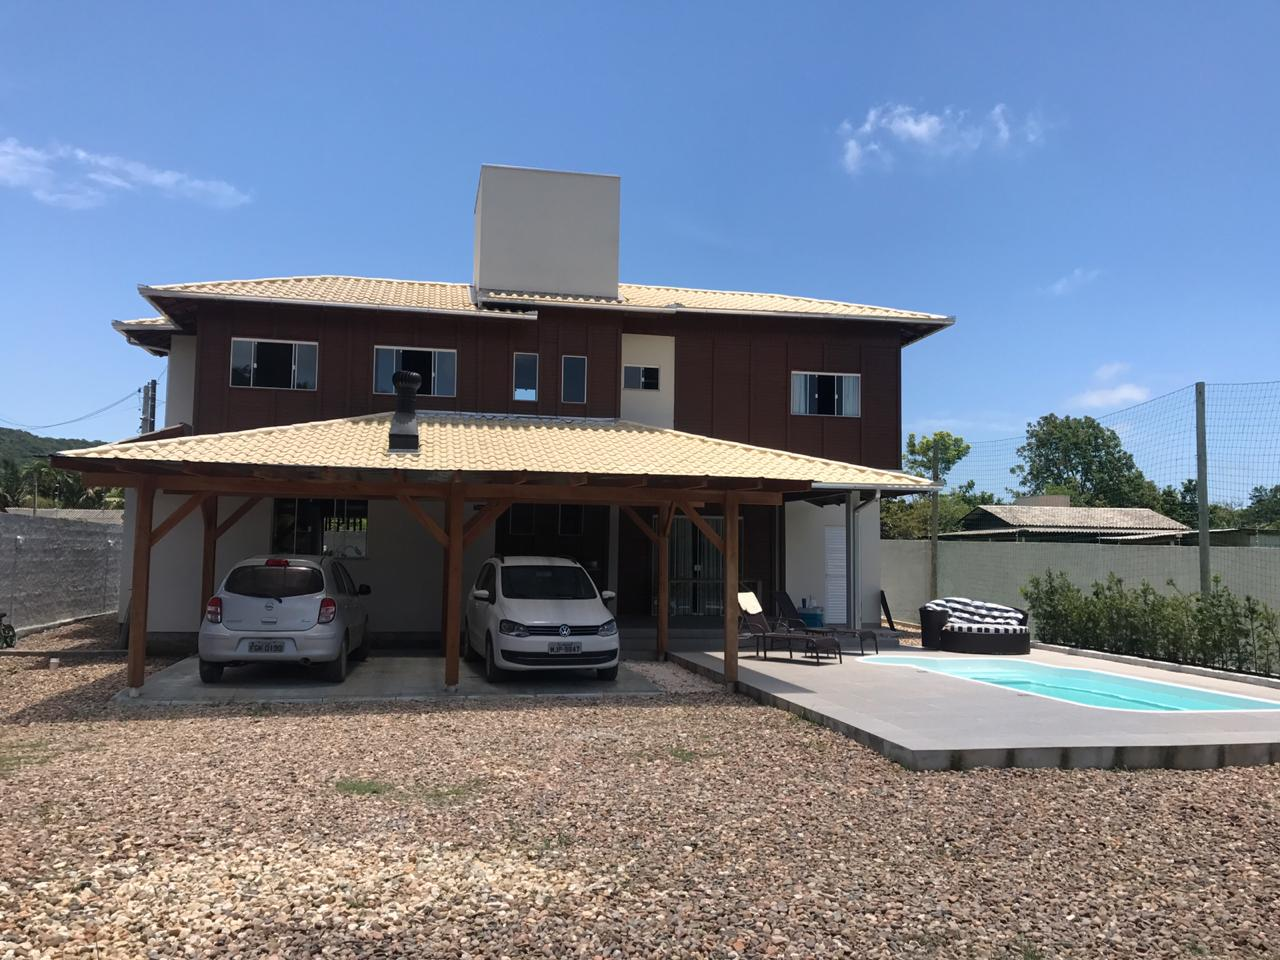 Cadin Imóveis - Venda - Sítio - Santa Lídia - Penha - SC